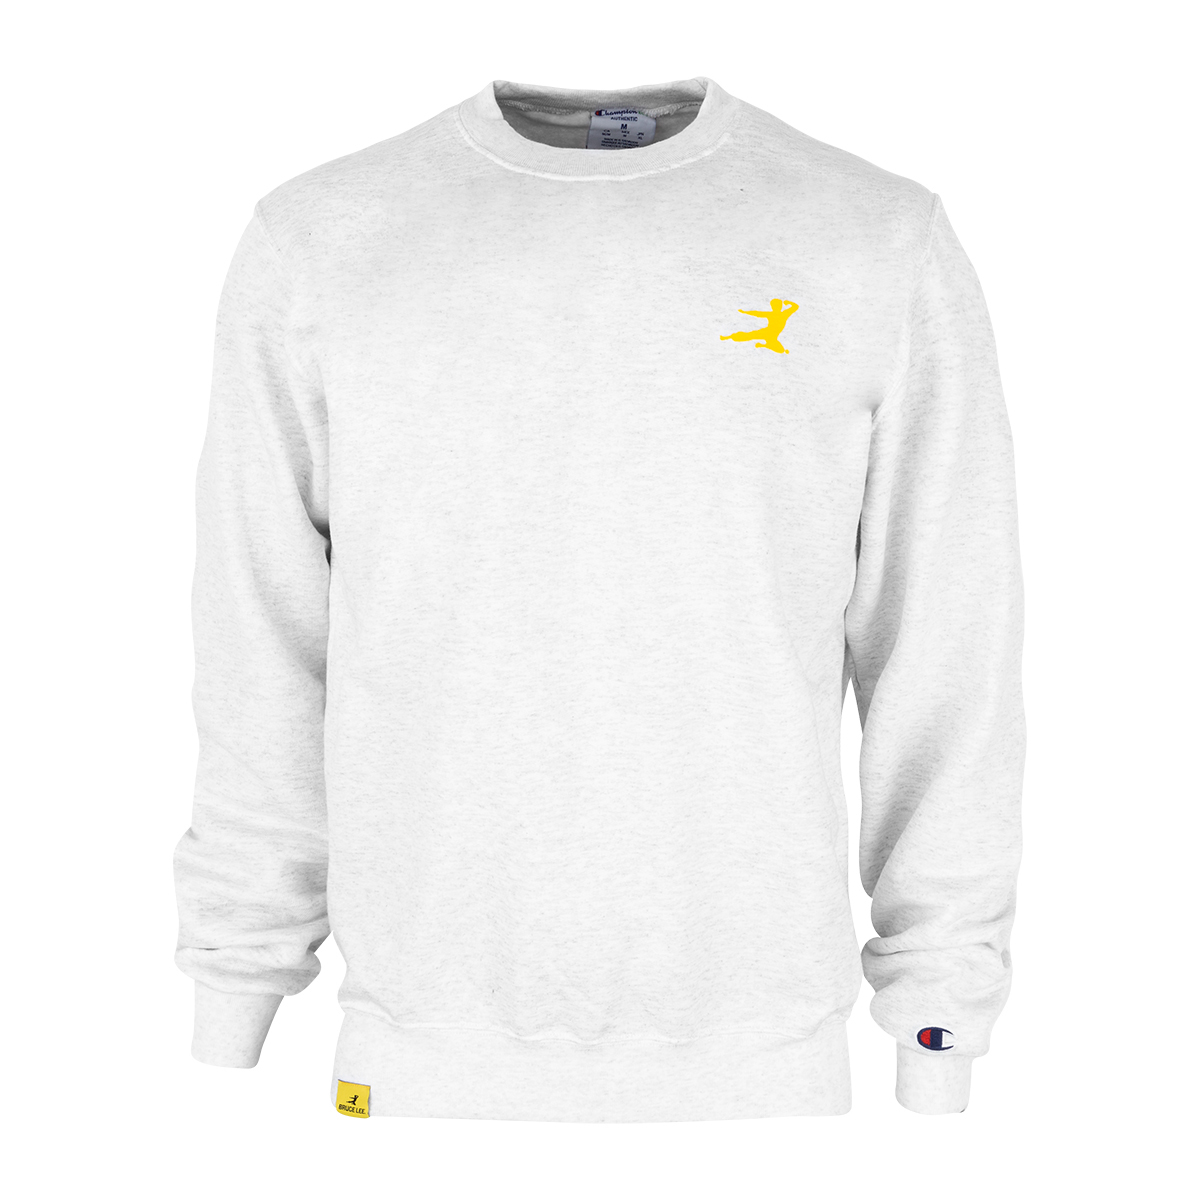 Flying Man SM Champion Crewneck Sweatshirt